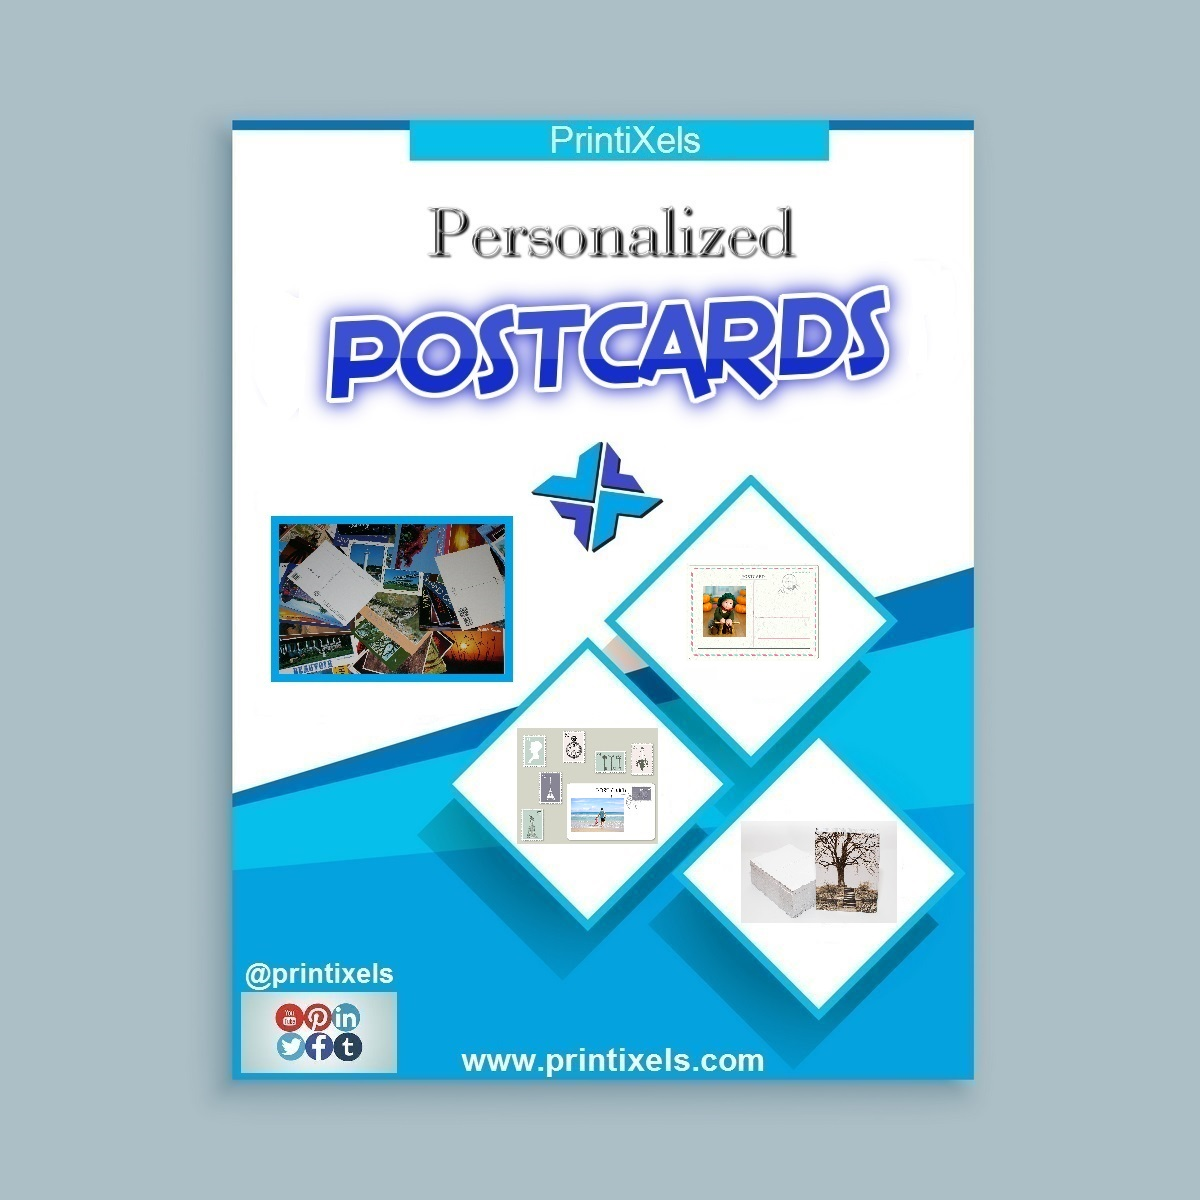 Personalized Photo Postcards Printixels Philippines